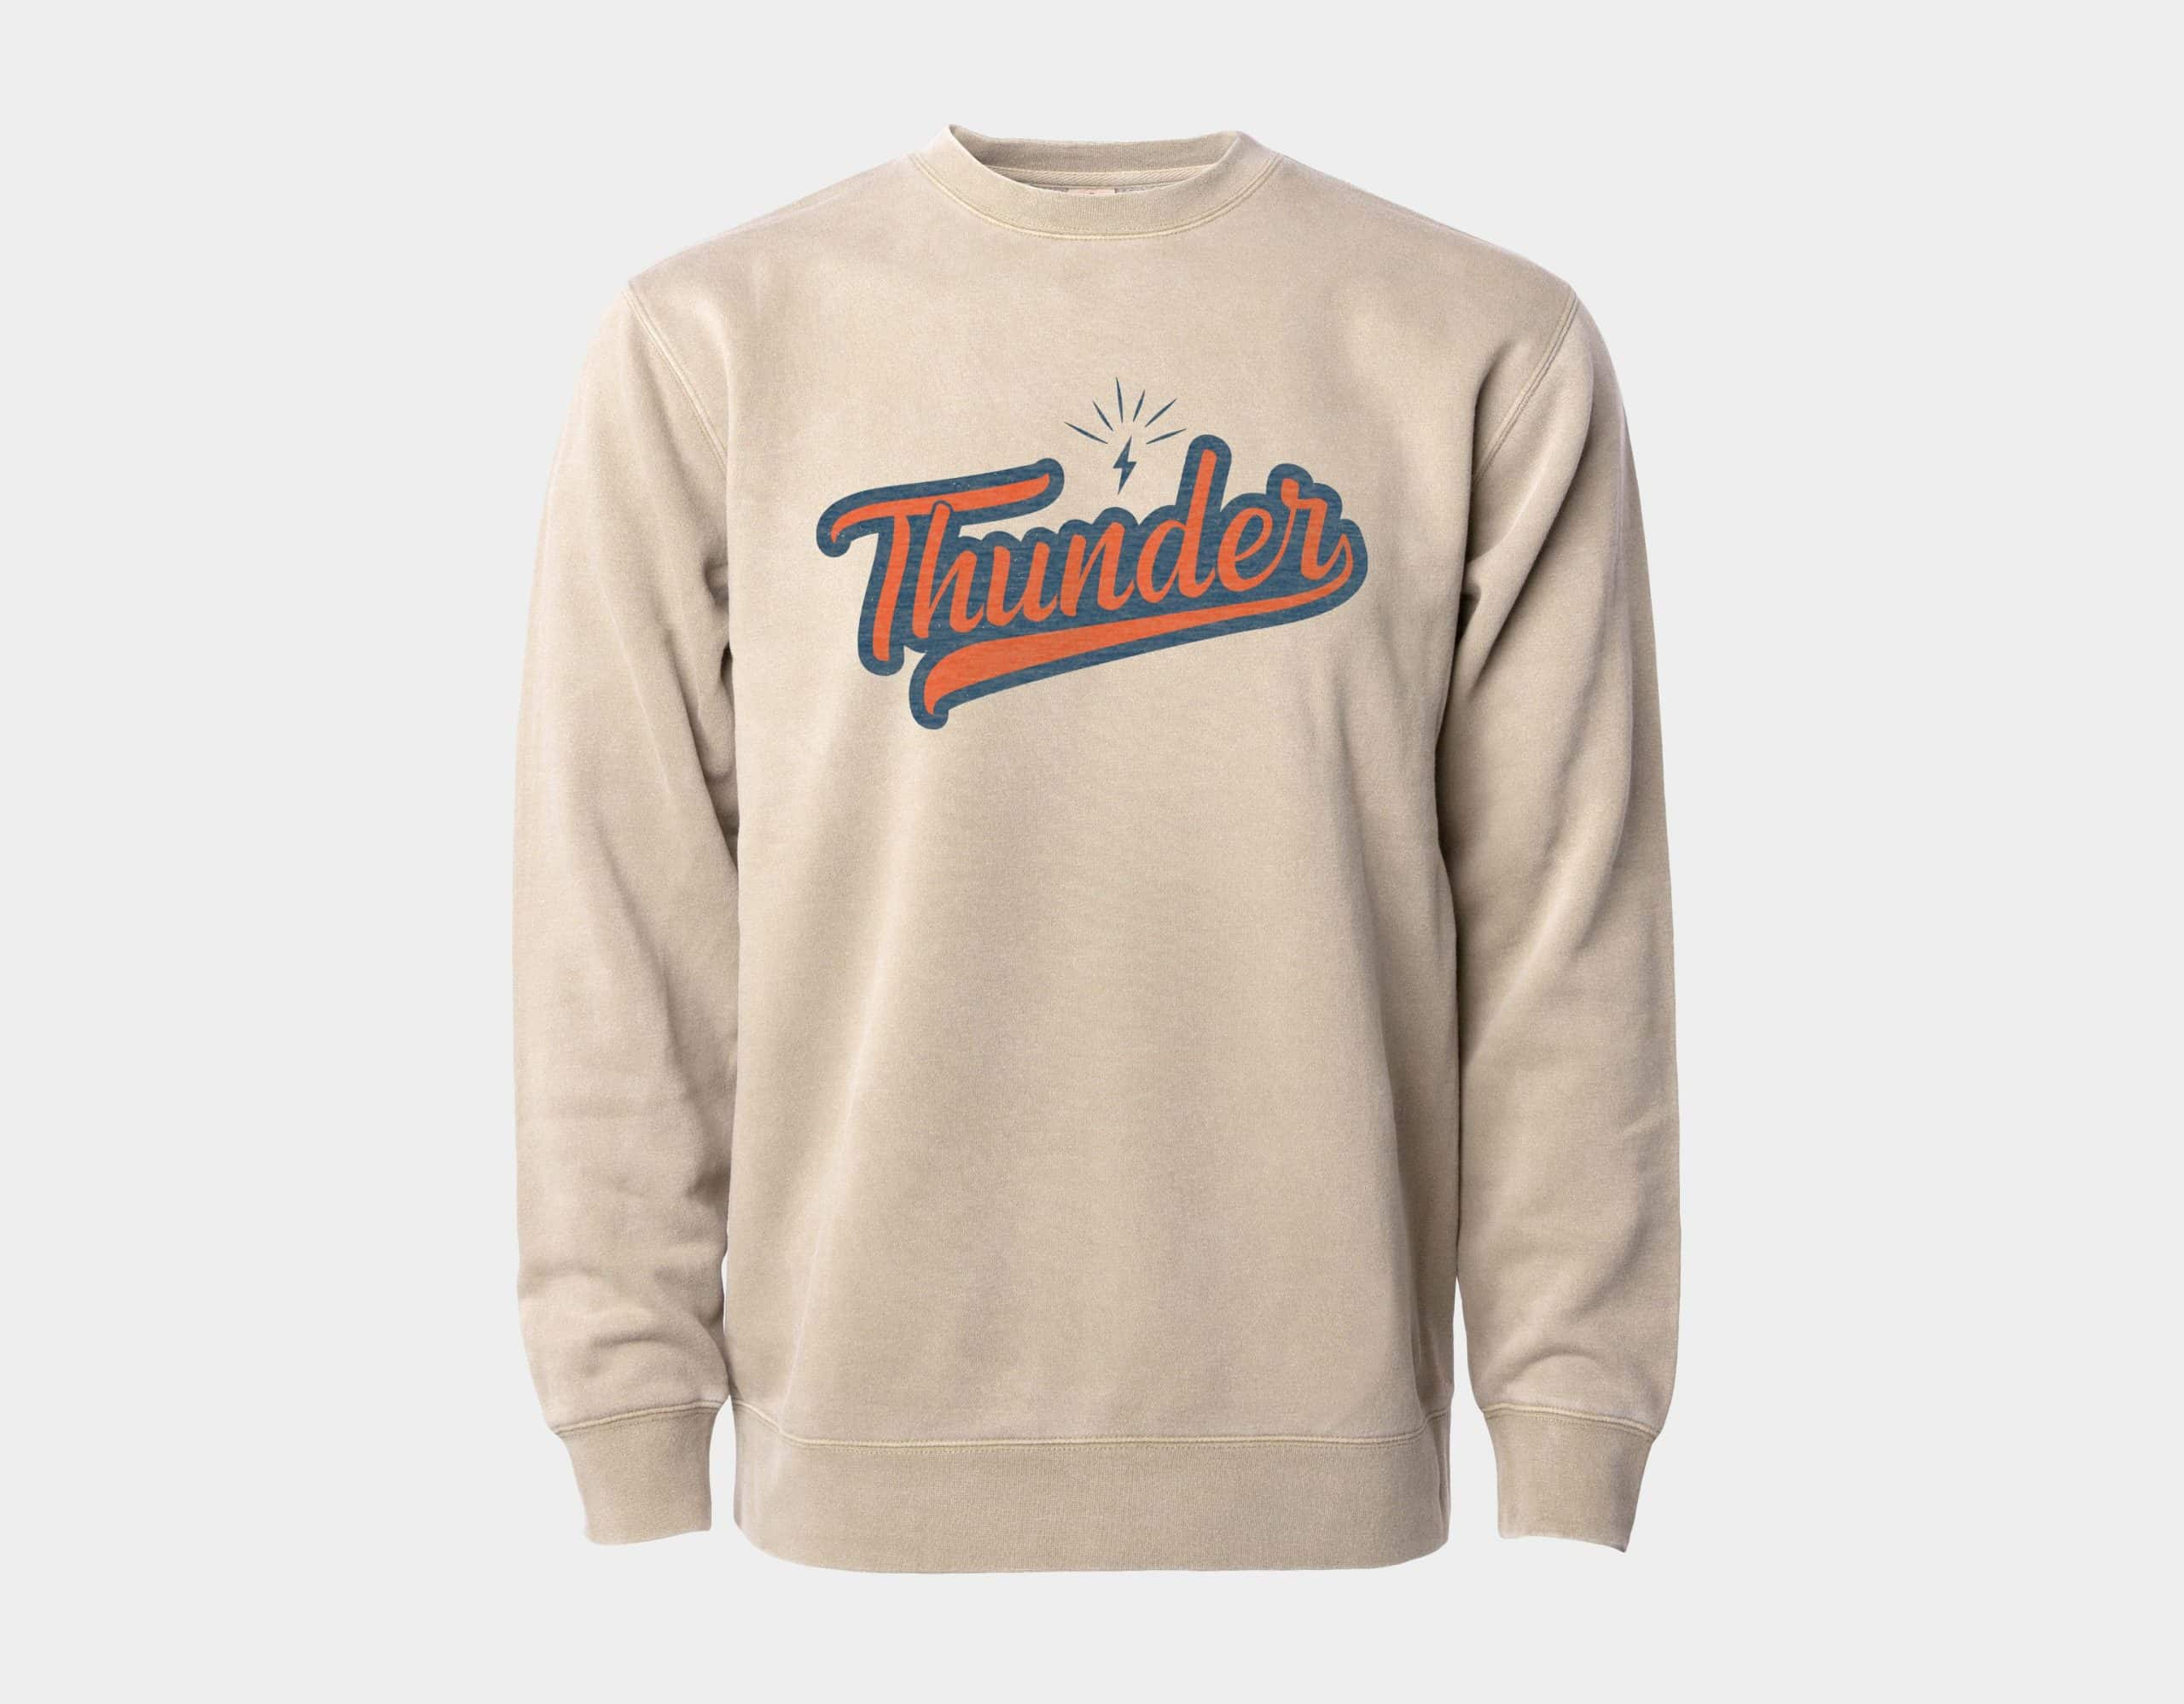 Thunder Traditions Pullover Sweatshirt